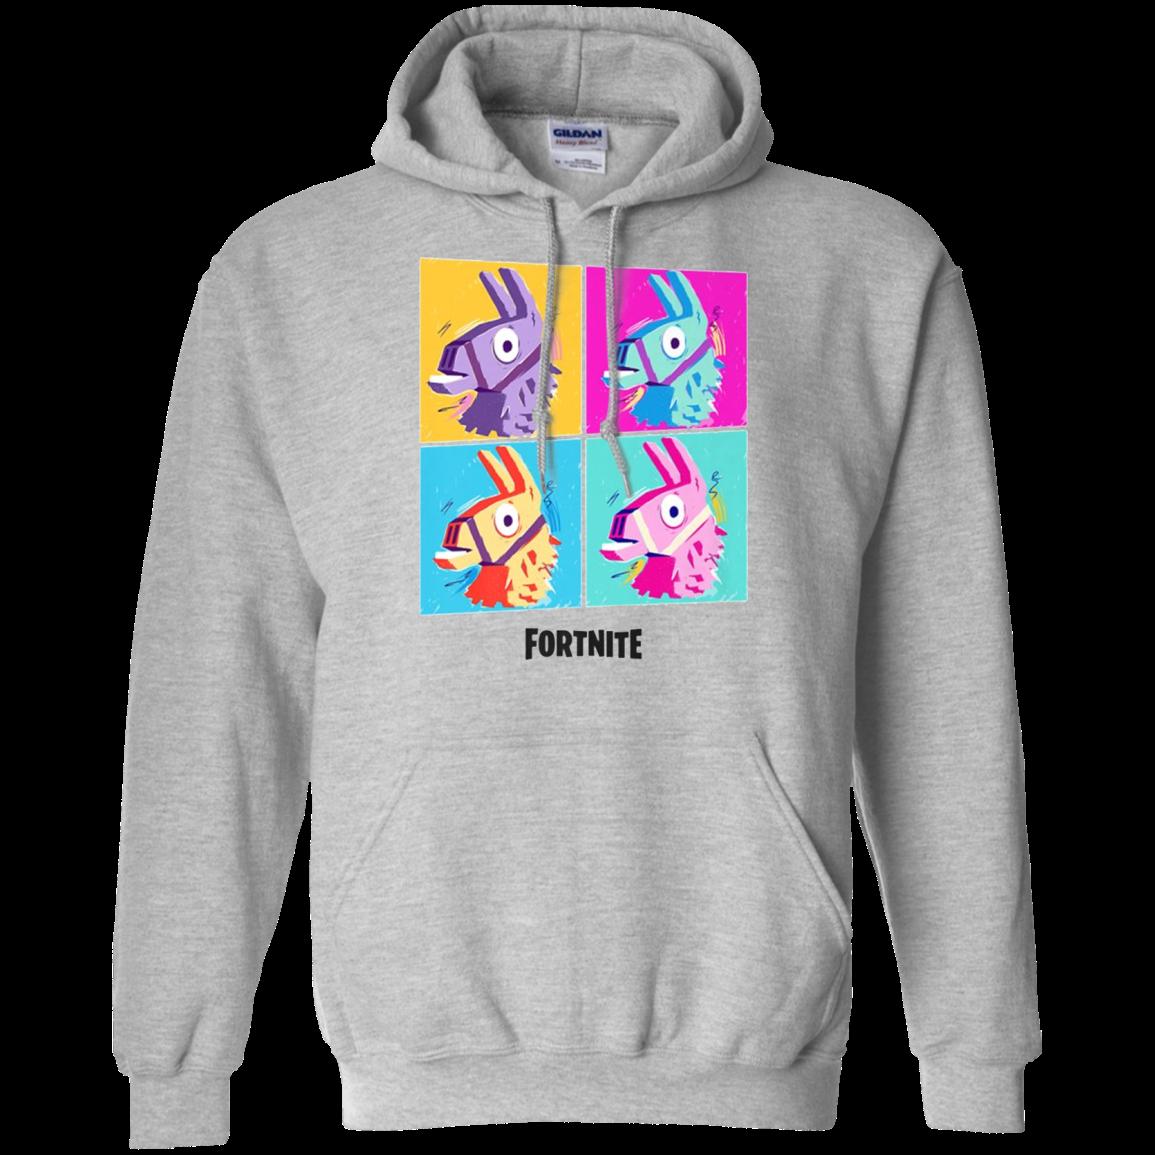 Fortnite Four Llamas T Shirt Hoodie Sweater Fortnite Clothes Stuff